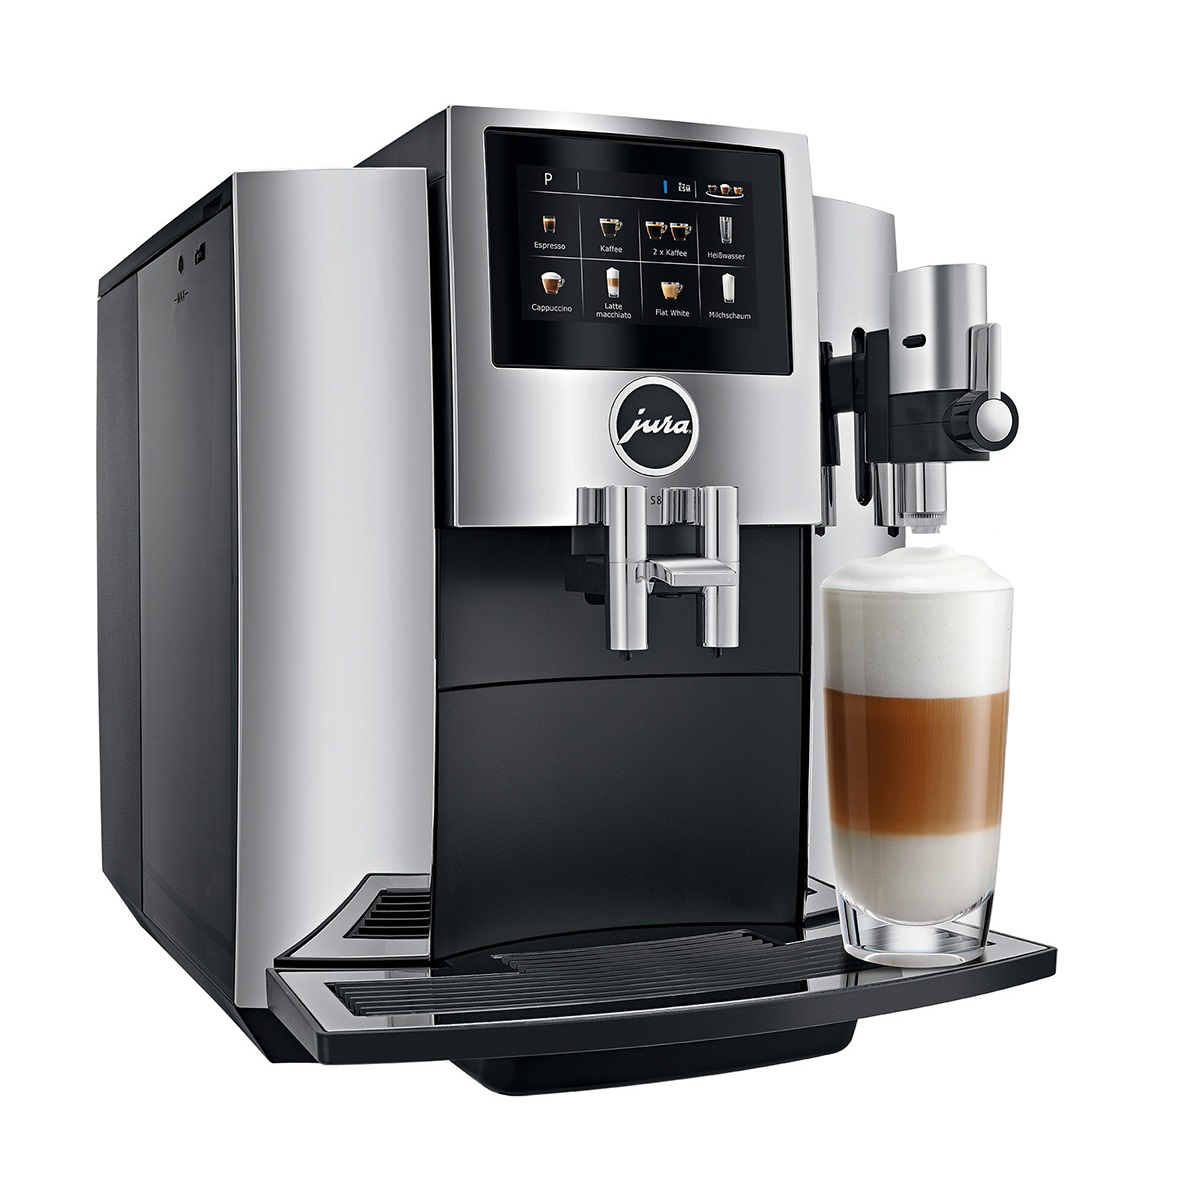 Espressor automat Jura S8, 15 bari, 1.9 l, 280g, rasnita AromaG3, 15 specialitati One Touch, touchscreen, Chrome+ cadou cafea